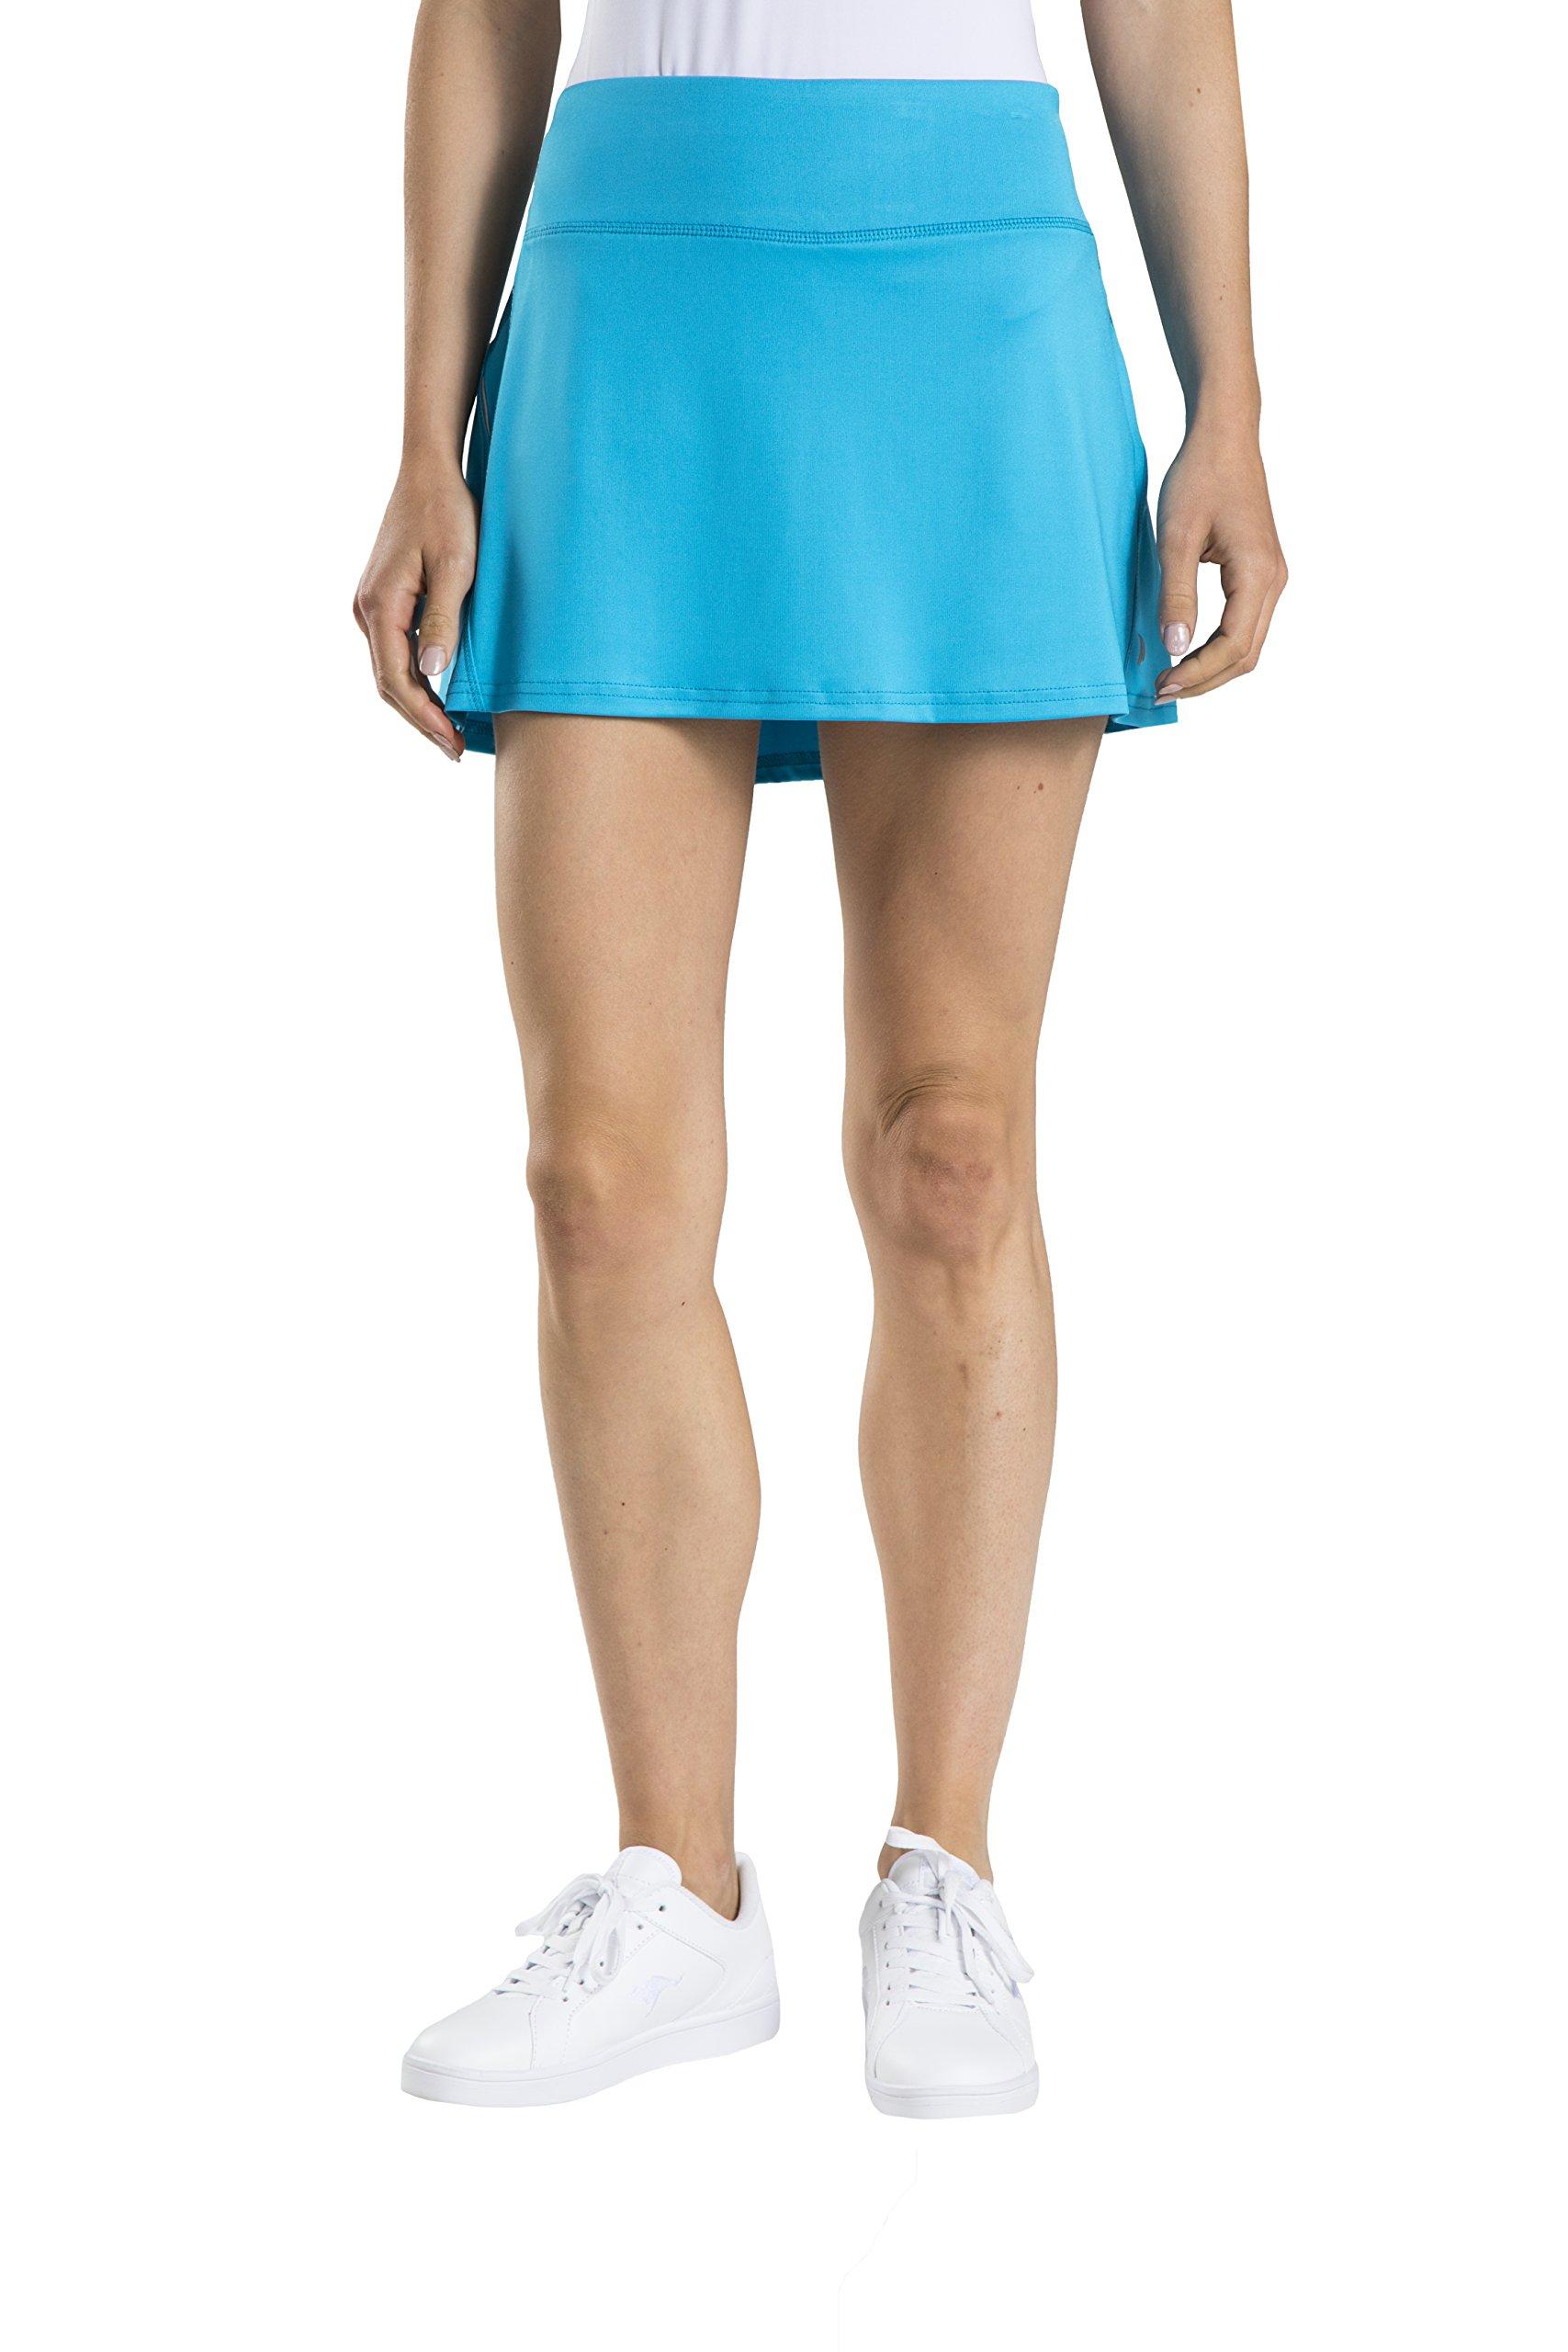 Prince Women's Stretch Knit Mesh Tennis Skort, Atomic Blue, X-Small by Prince